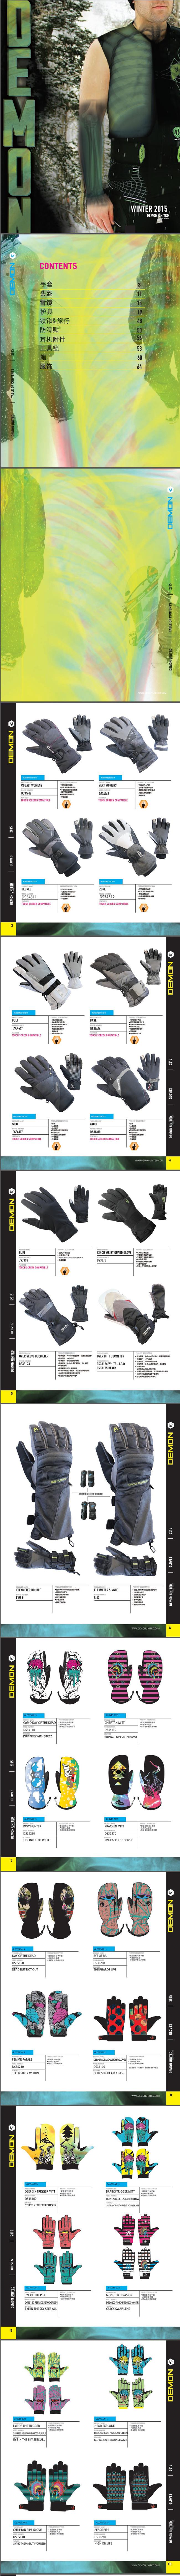 Demon手套